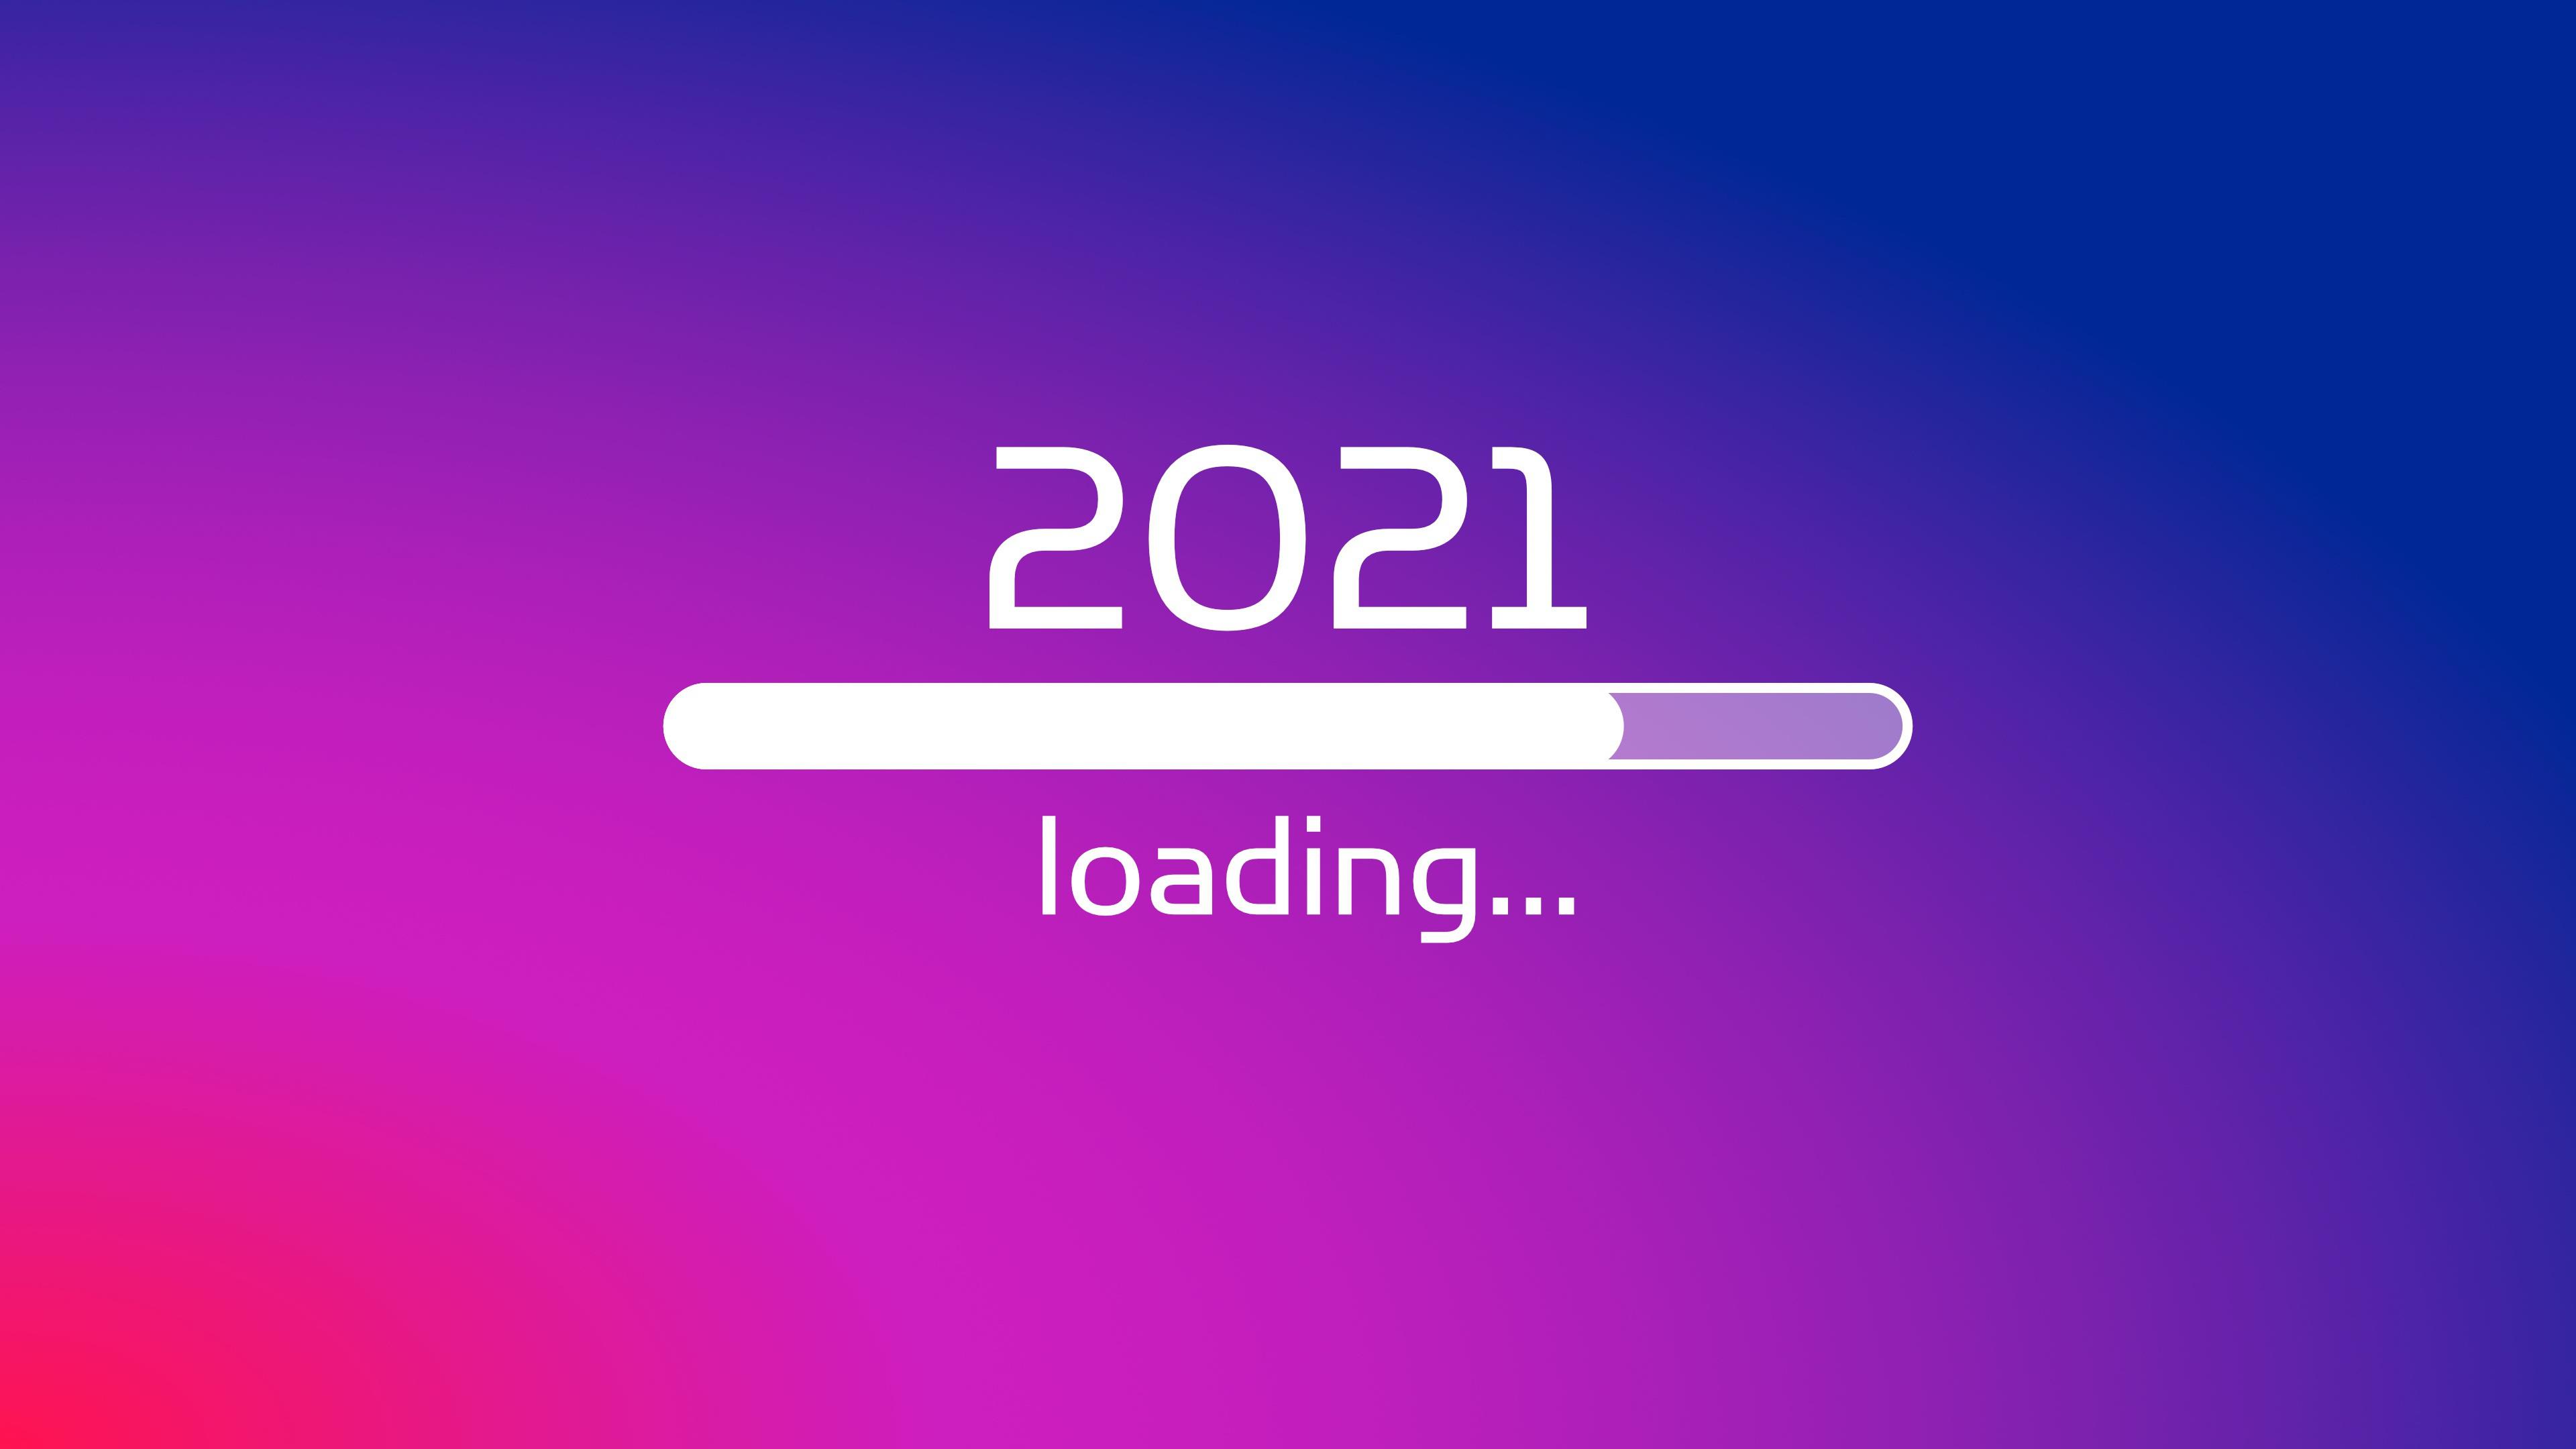 General 3840x2160 New Year 4K simple background minimalism loading gradient 2021 (Year) digital art